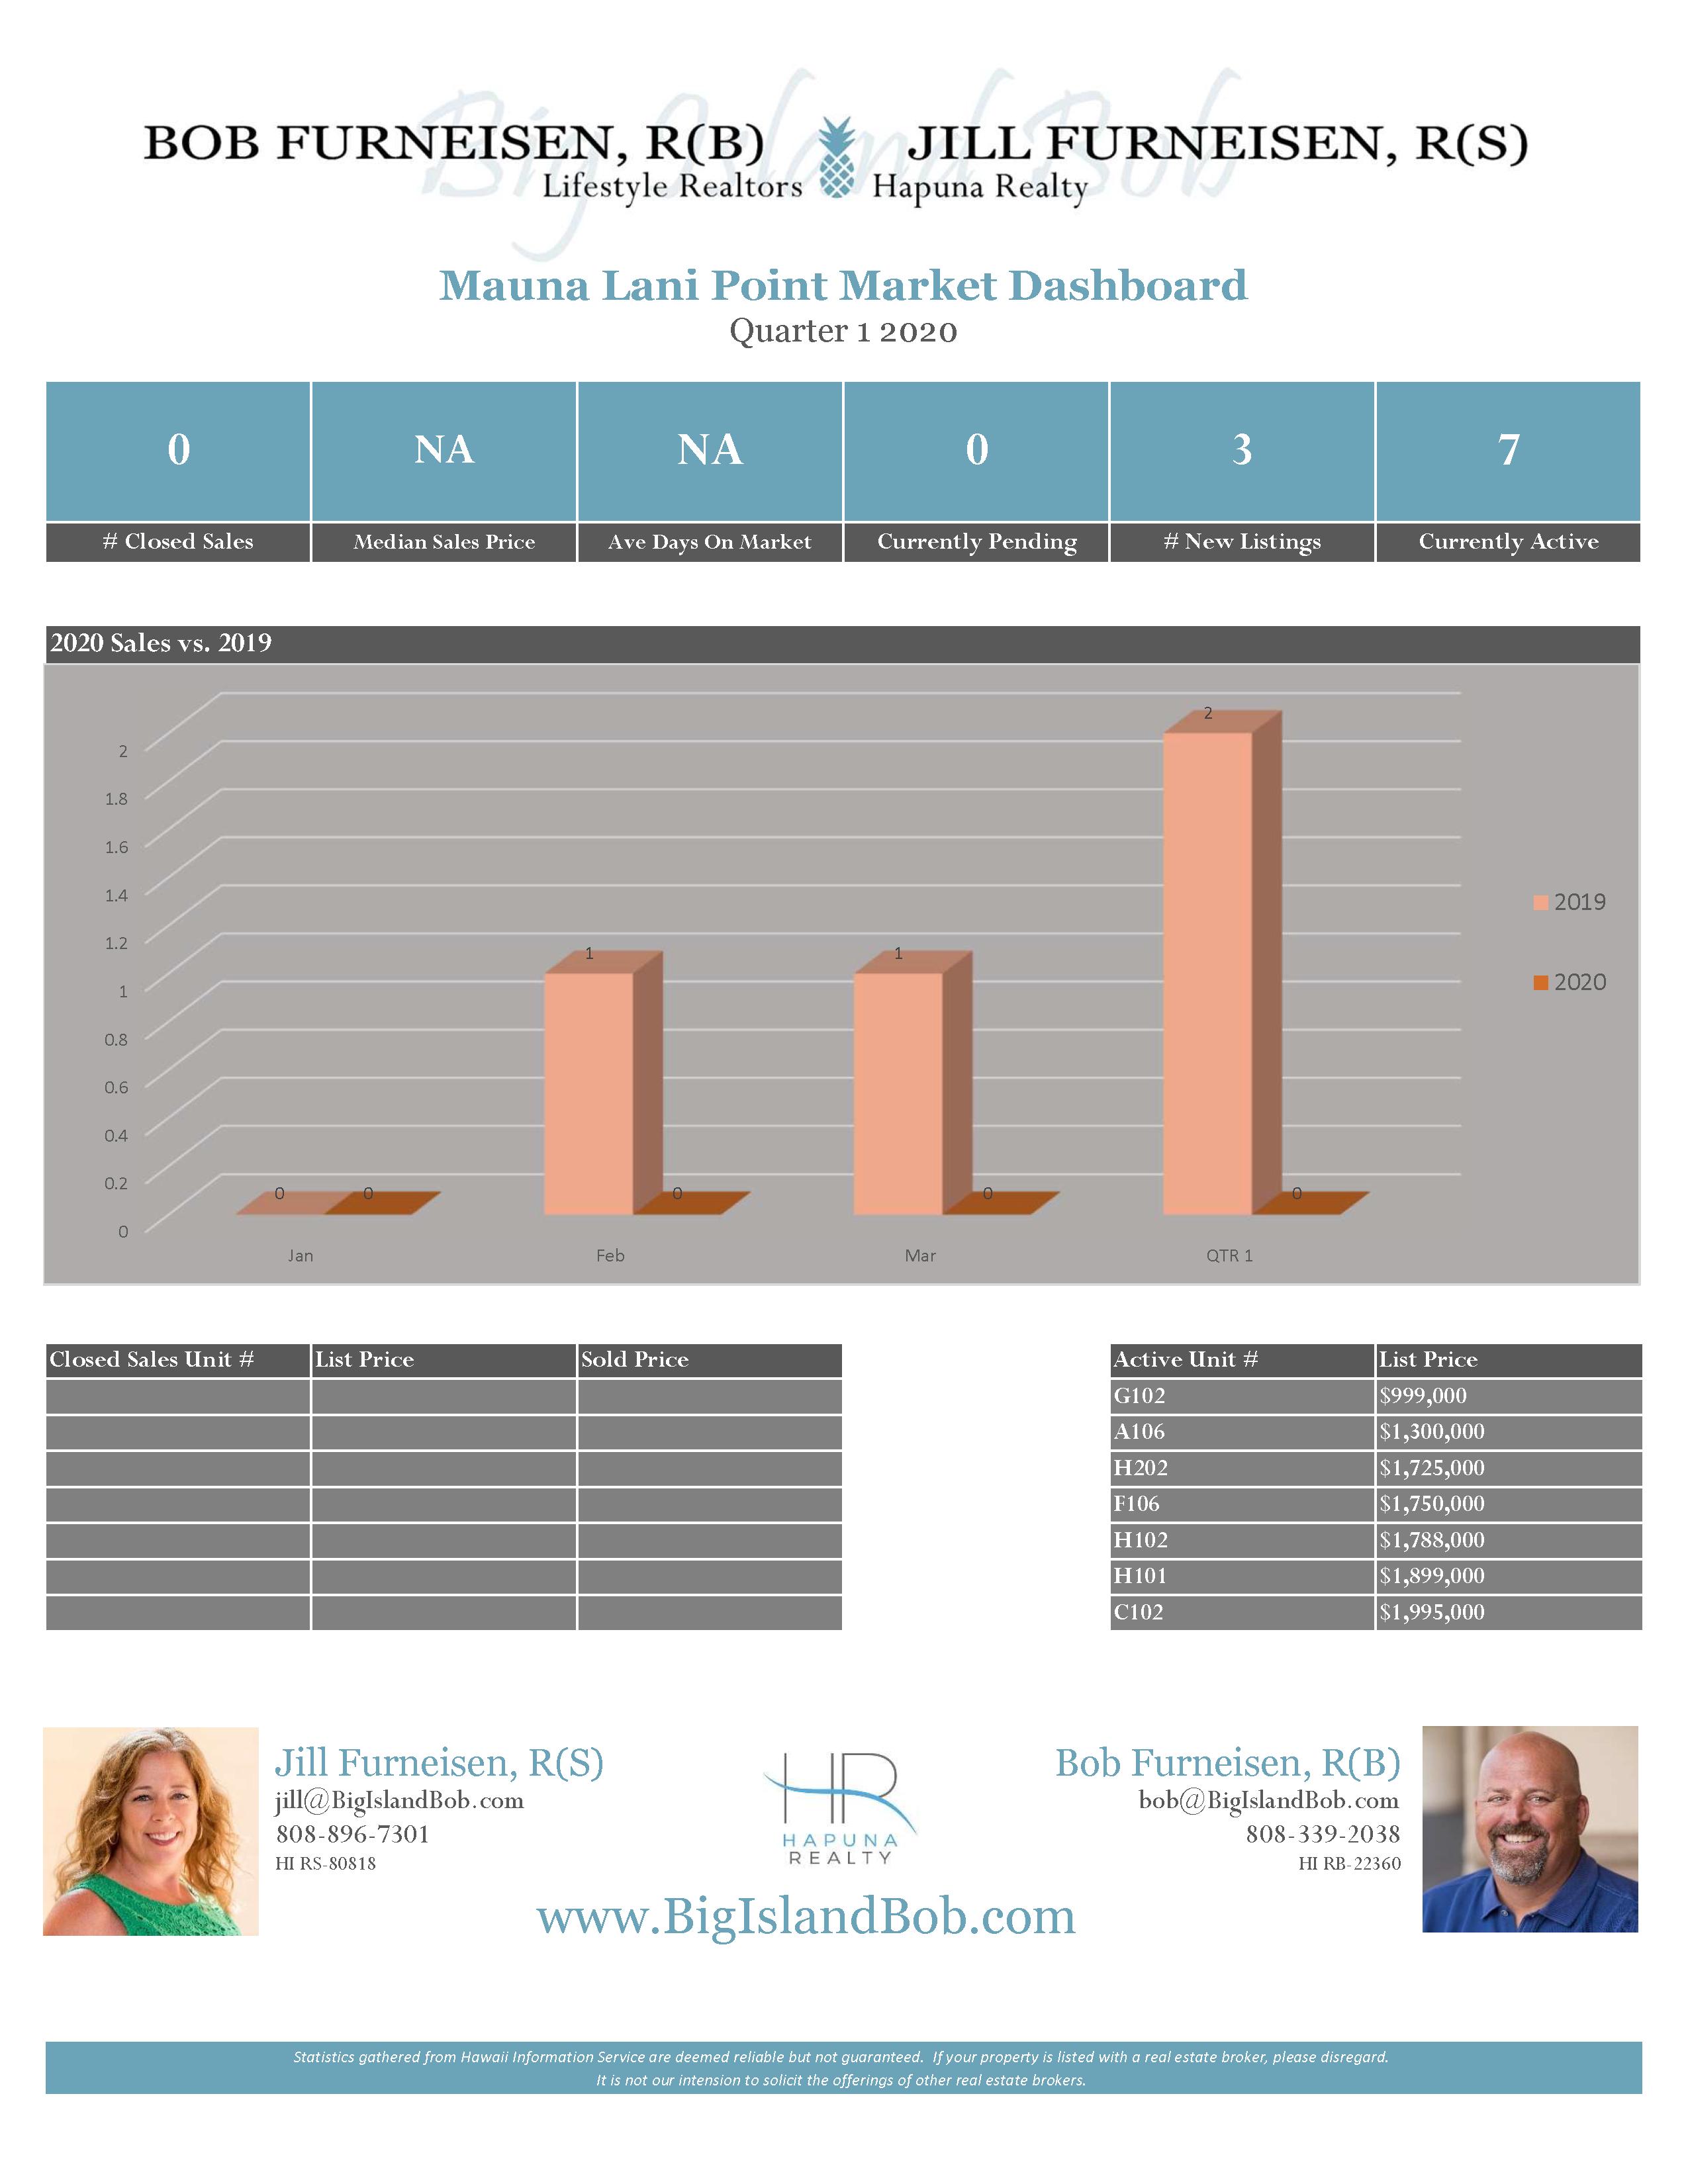 Mauna Lani Point Quarter 1 2020 Real Estate Market Dashboard